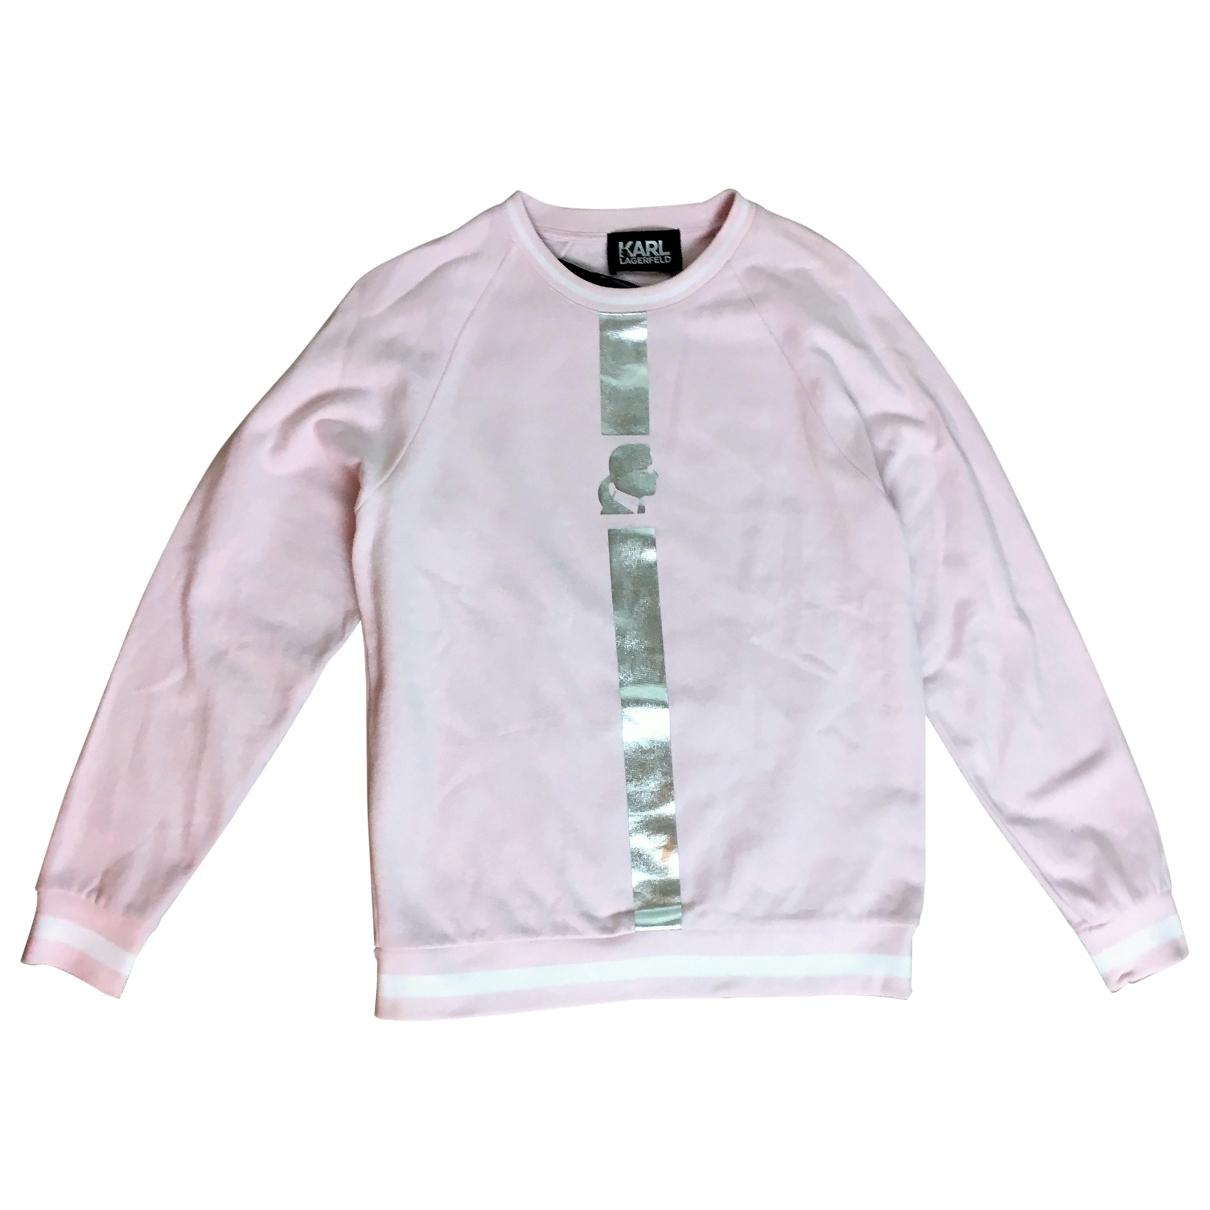 Karl Lagerfeld - Pull   pour femme en coton - rose